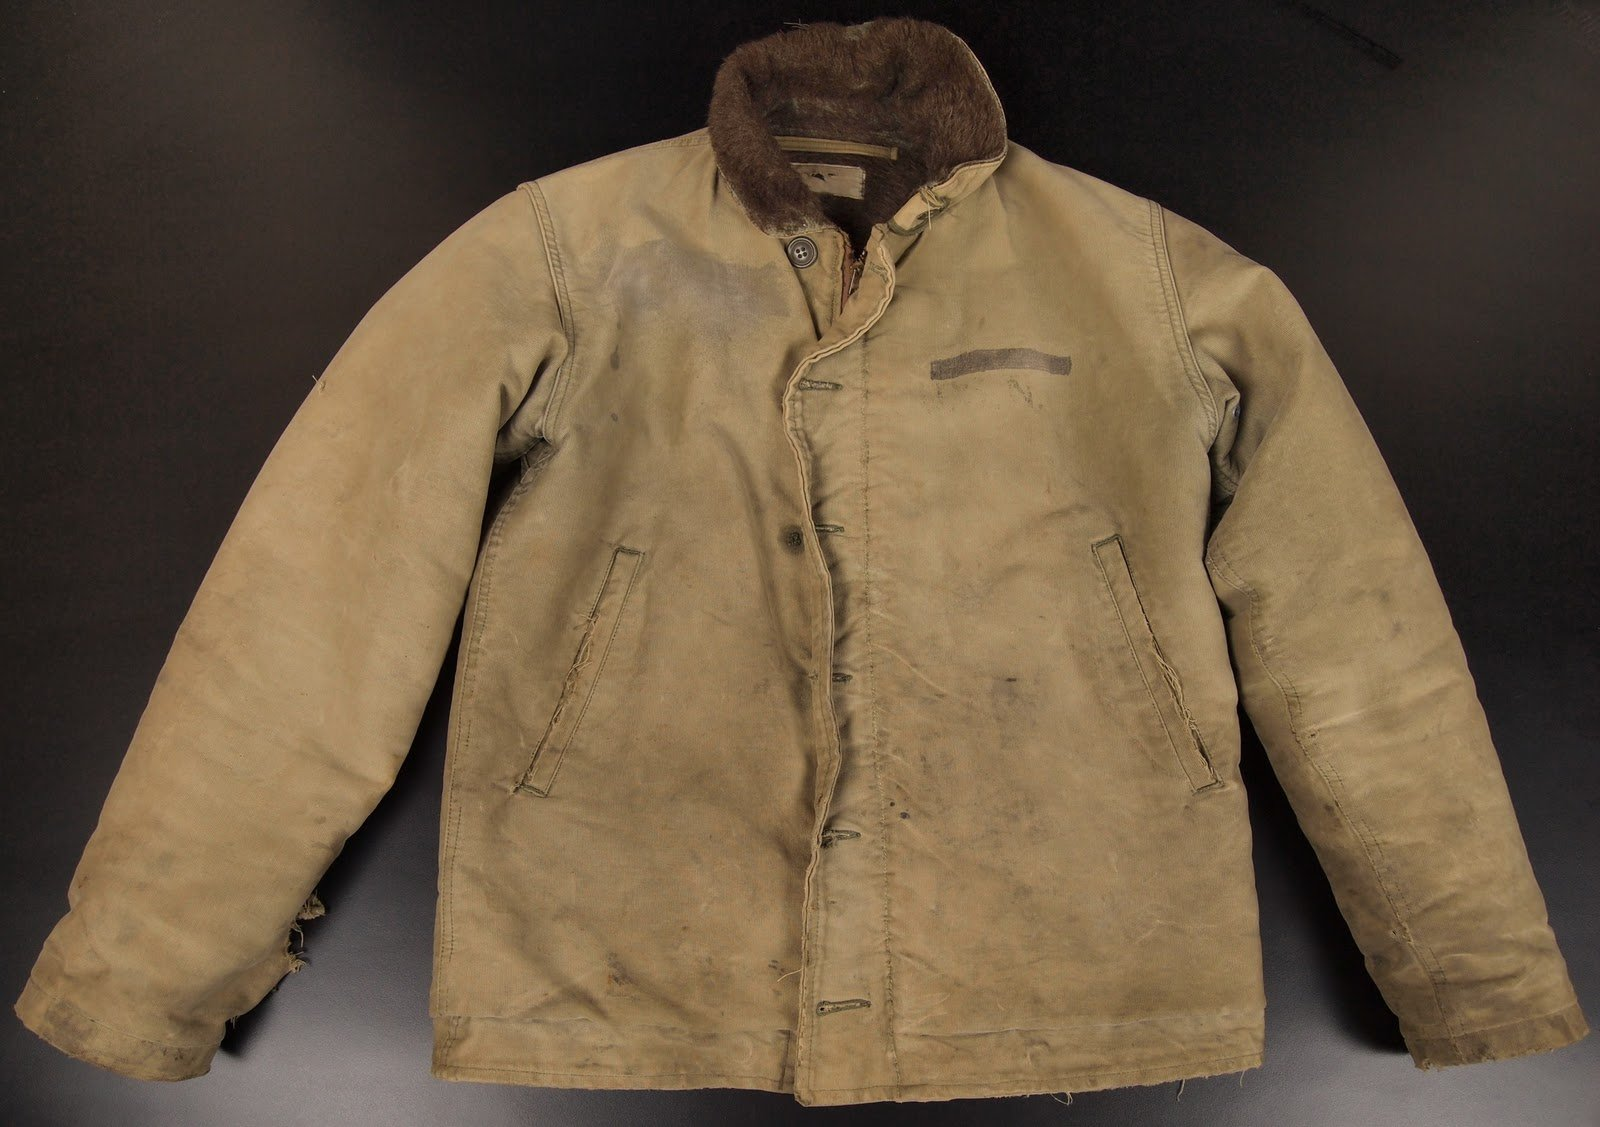 jaqueta da segunda guerra marinha americana